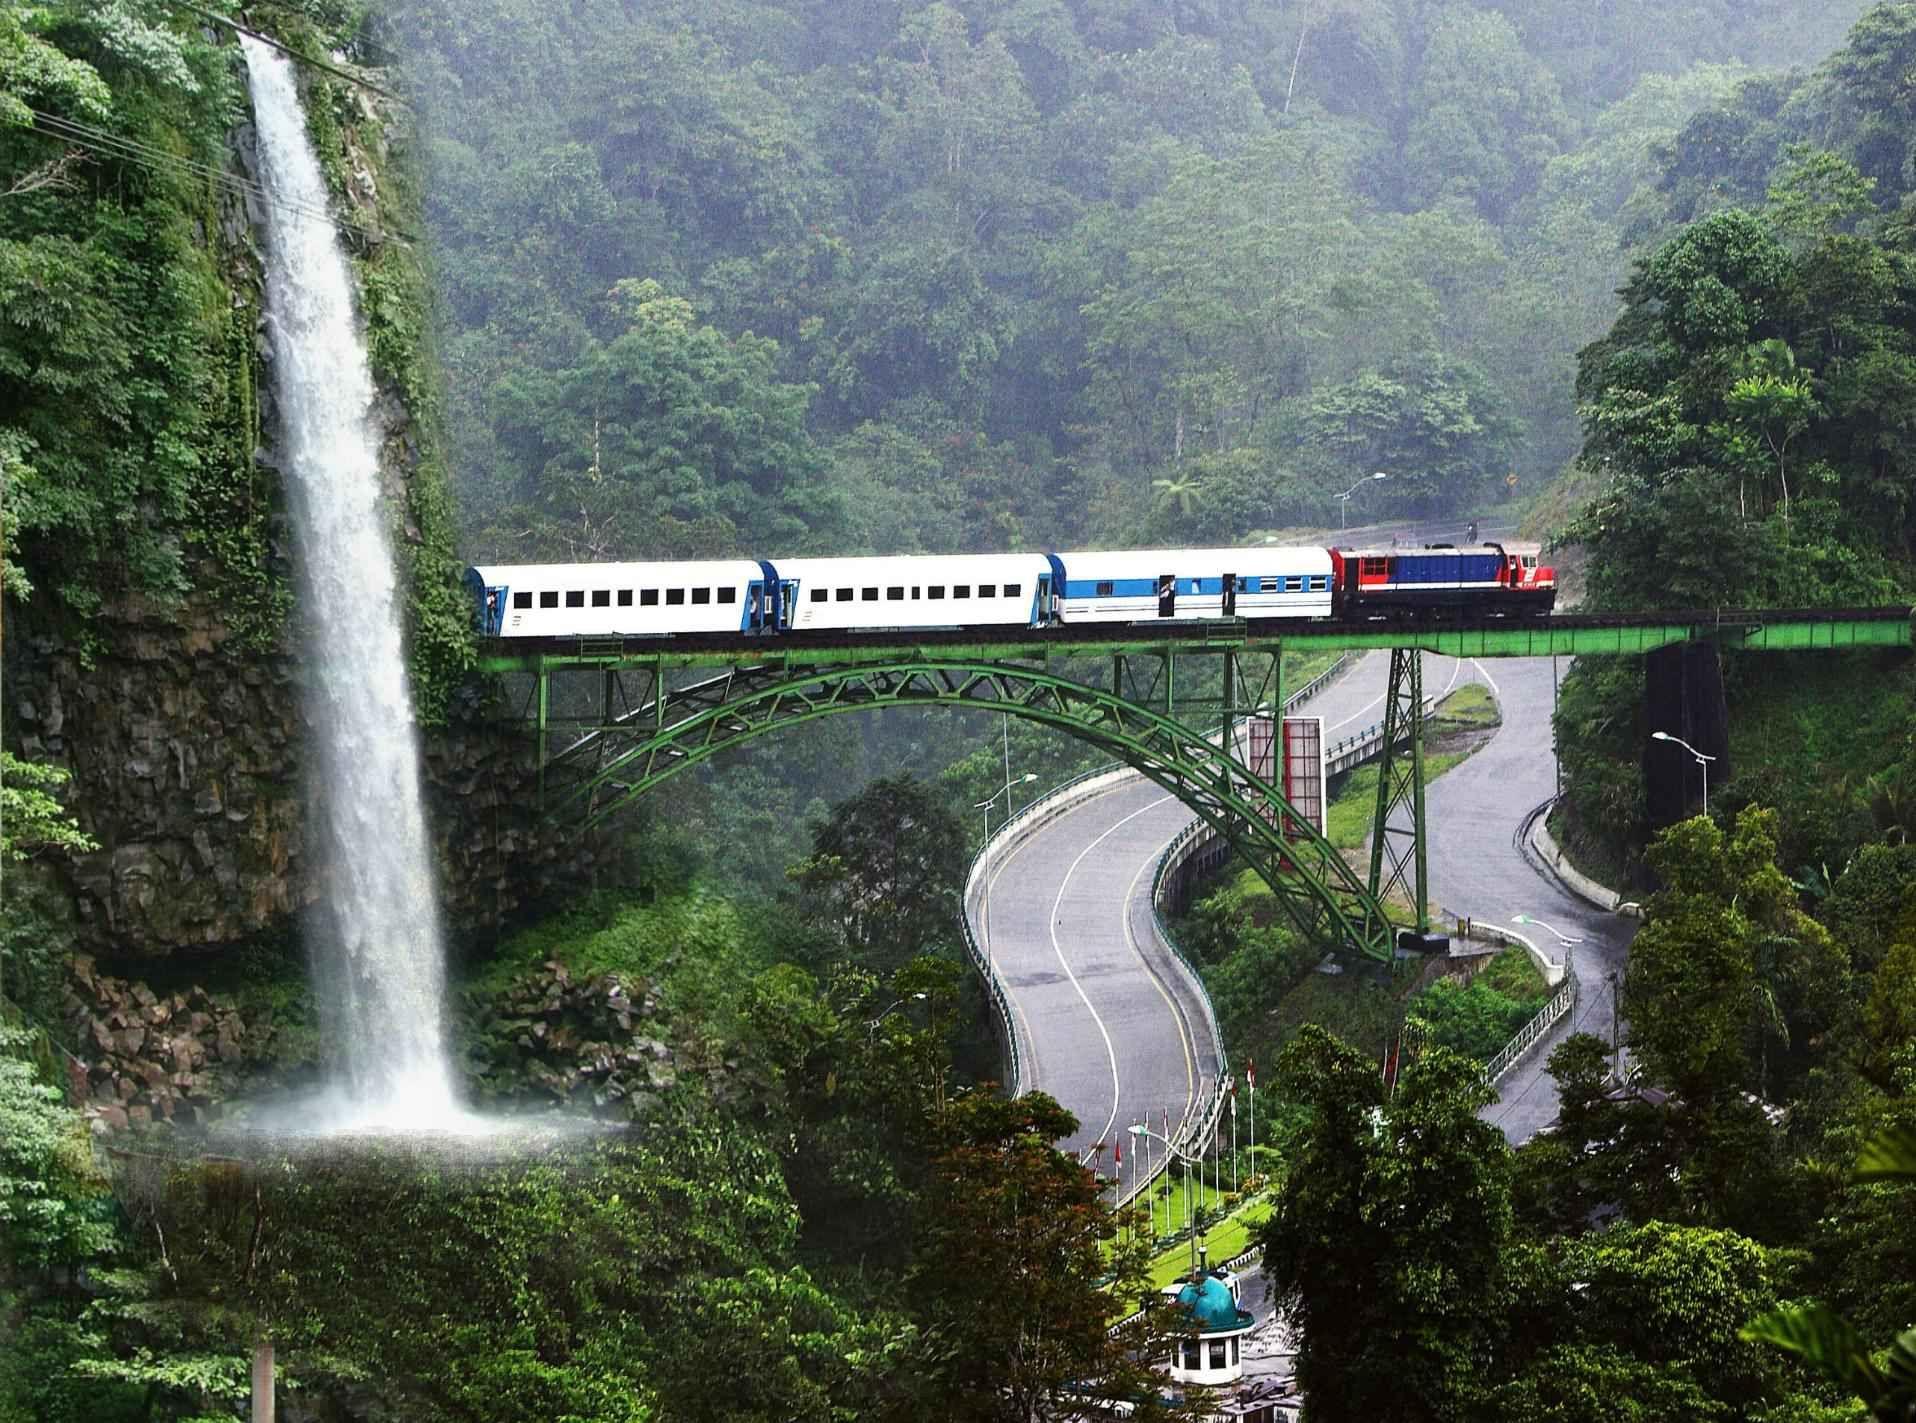 Wisata Bukittinggi Sumatera Barat Google Zoeken